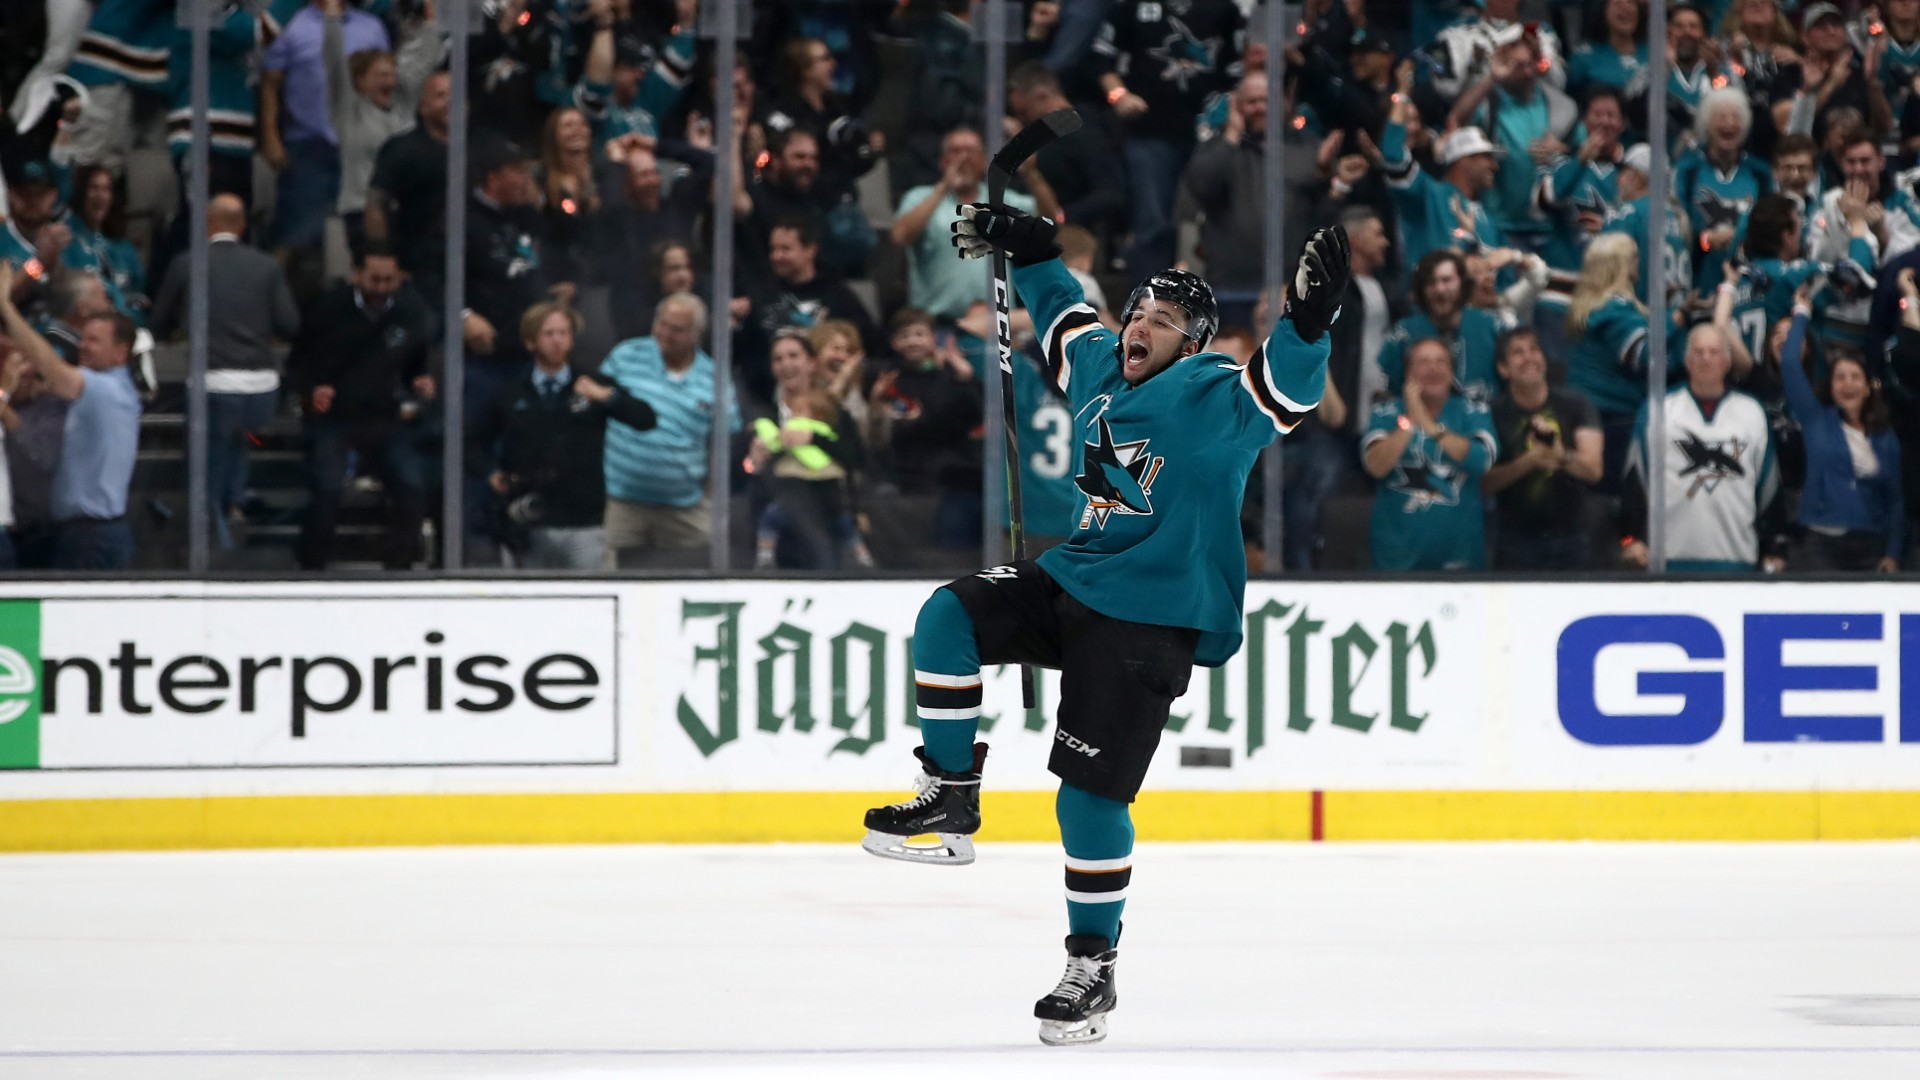 NHL free agency 2019: Sharks hold onto rising forward Kevin Labanc